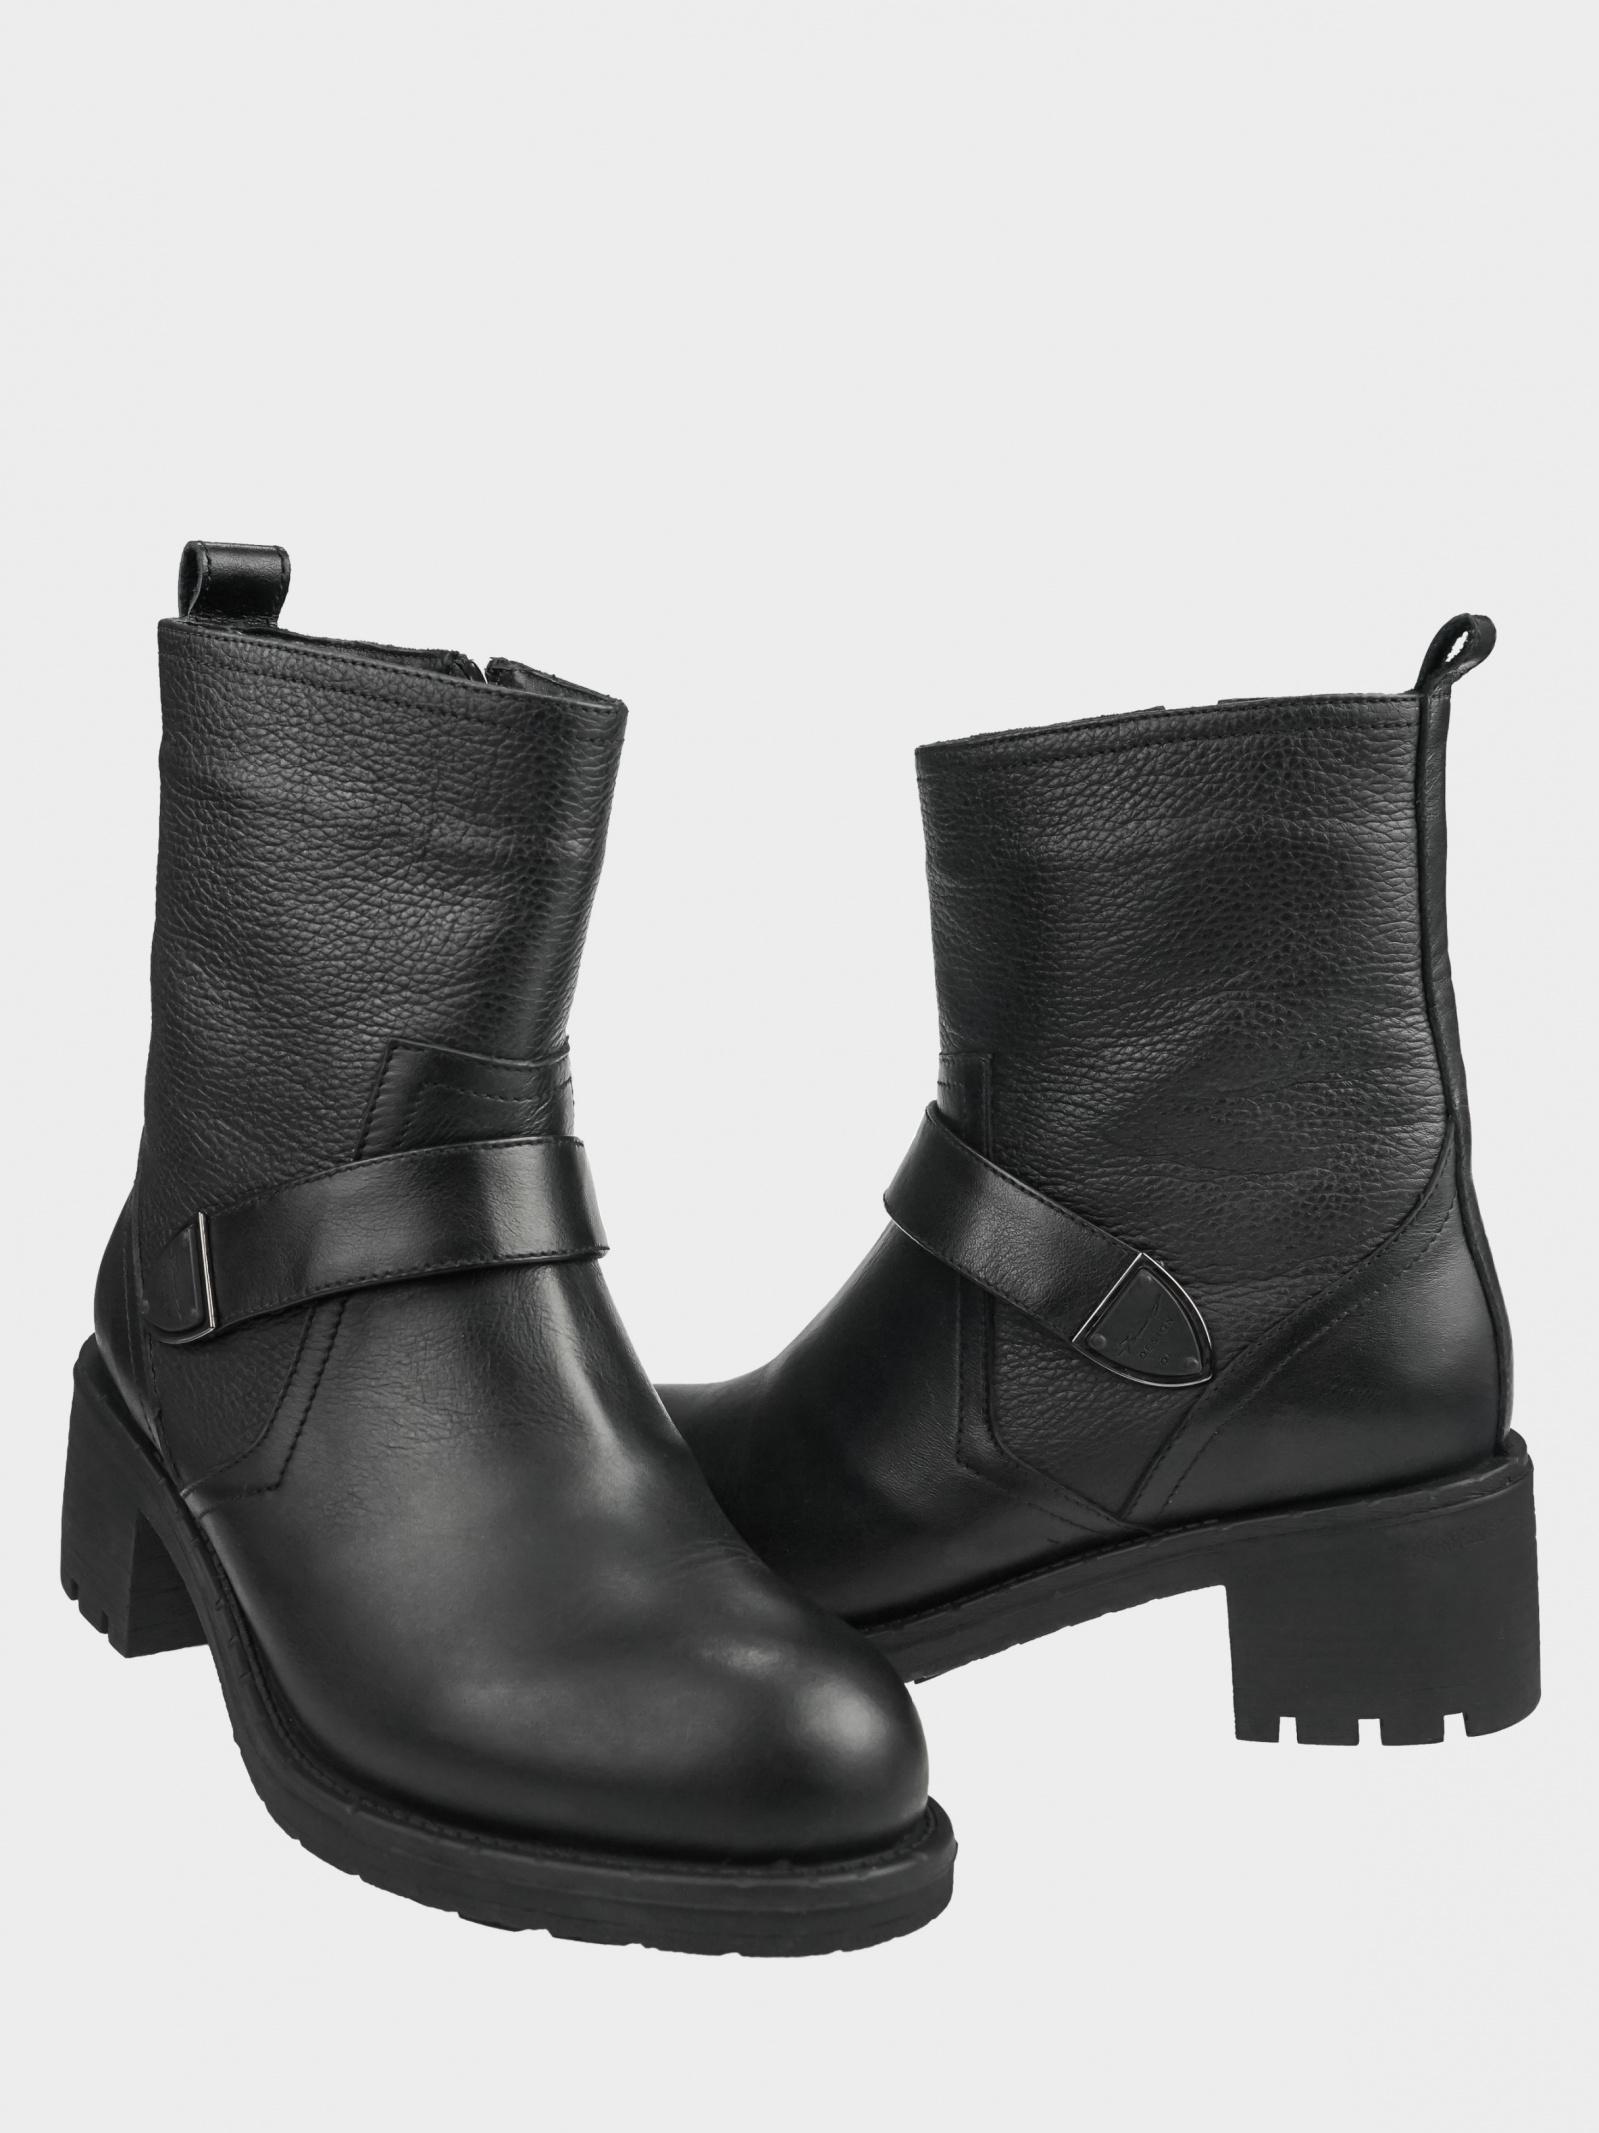 Ботинки женские LiONEli LZ5560-01 размеры обуви, 2017